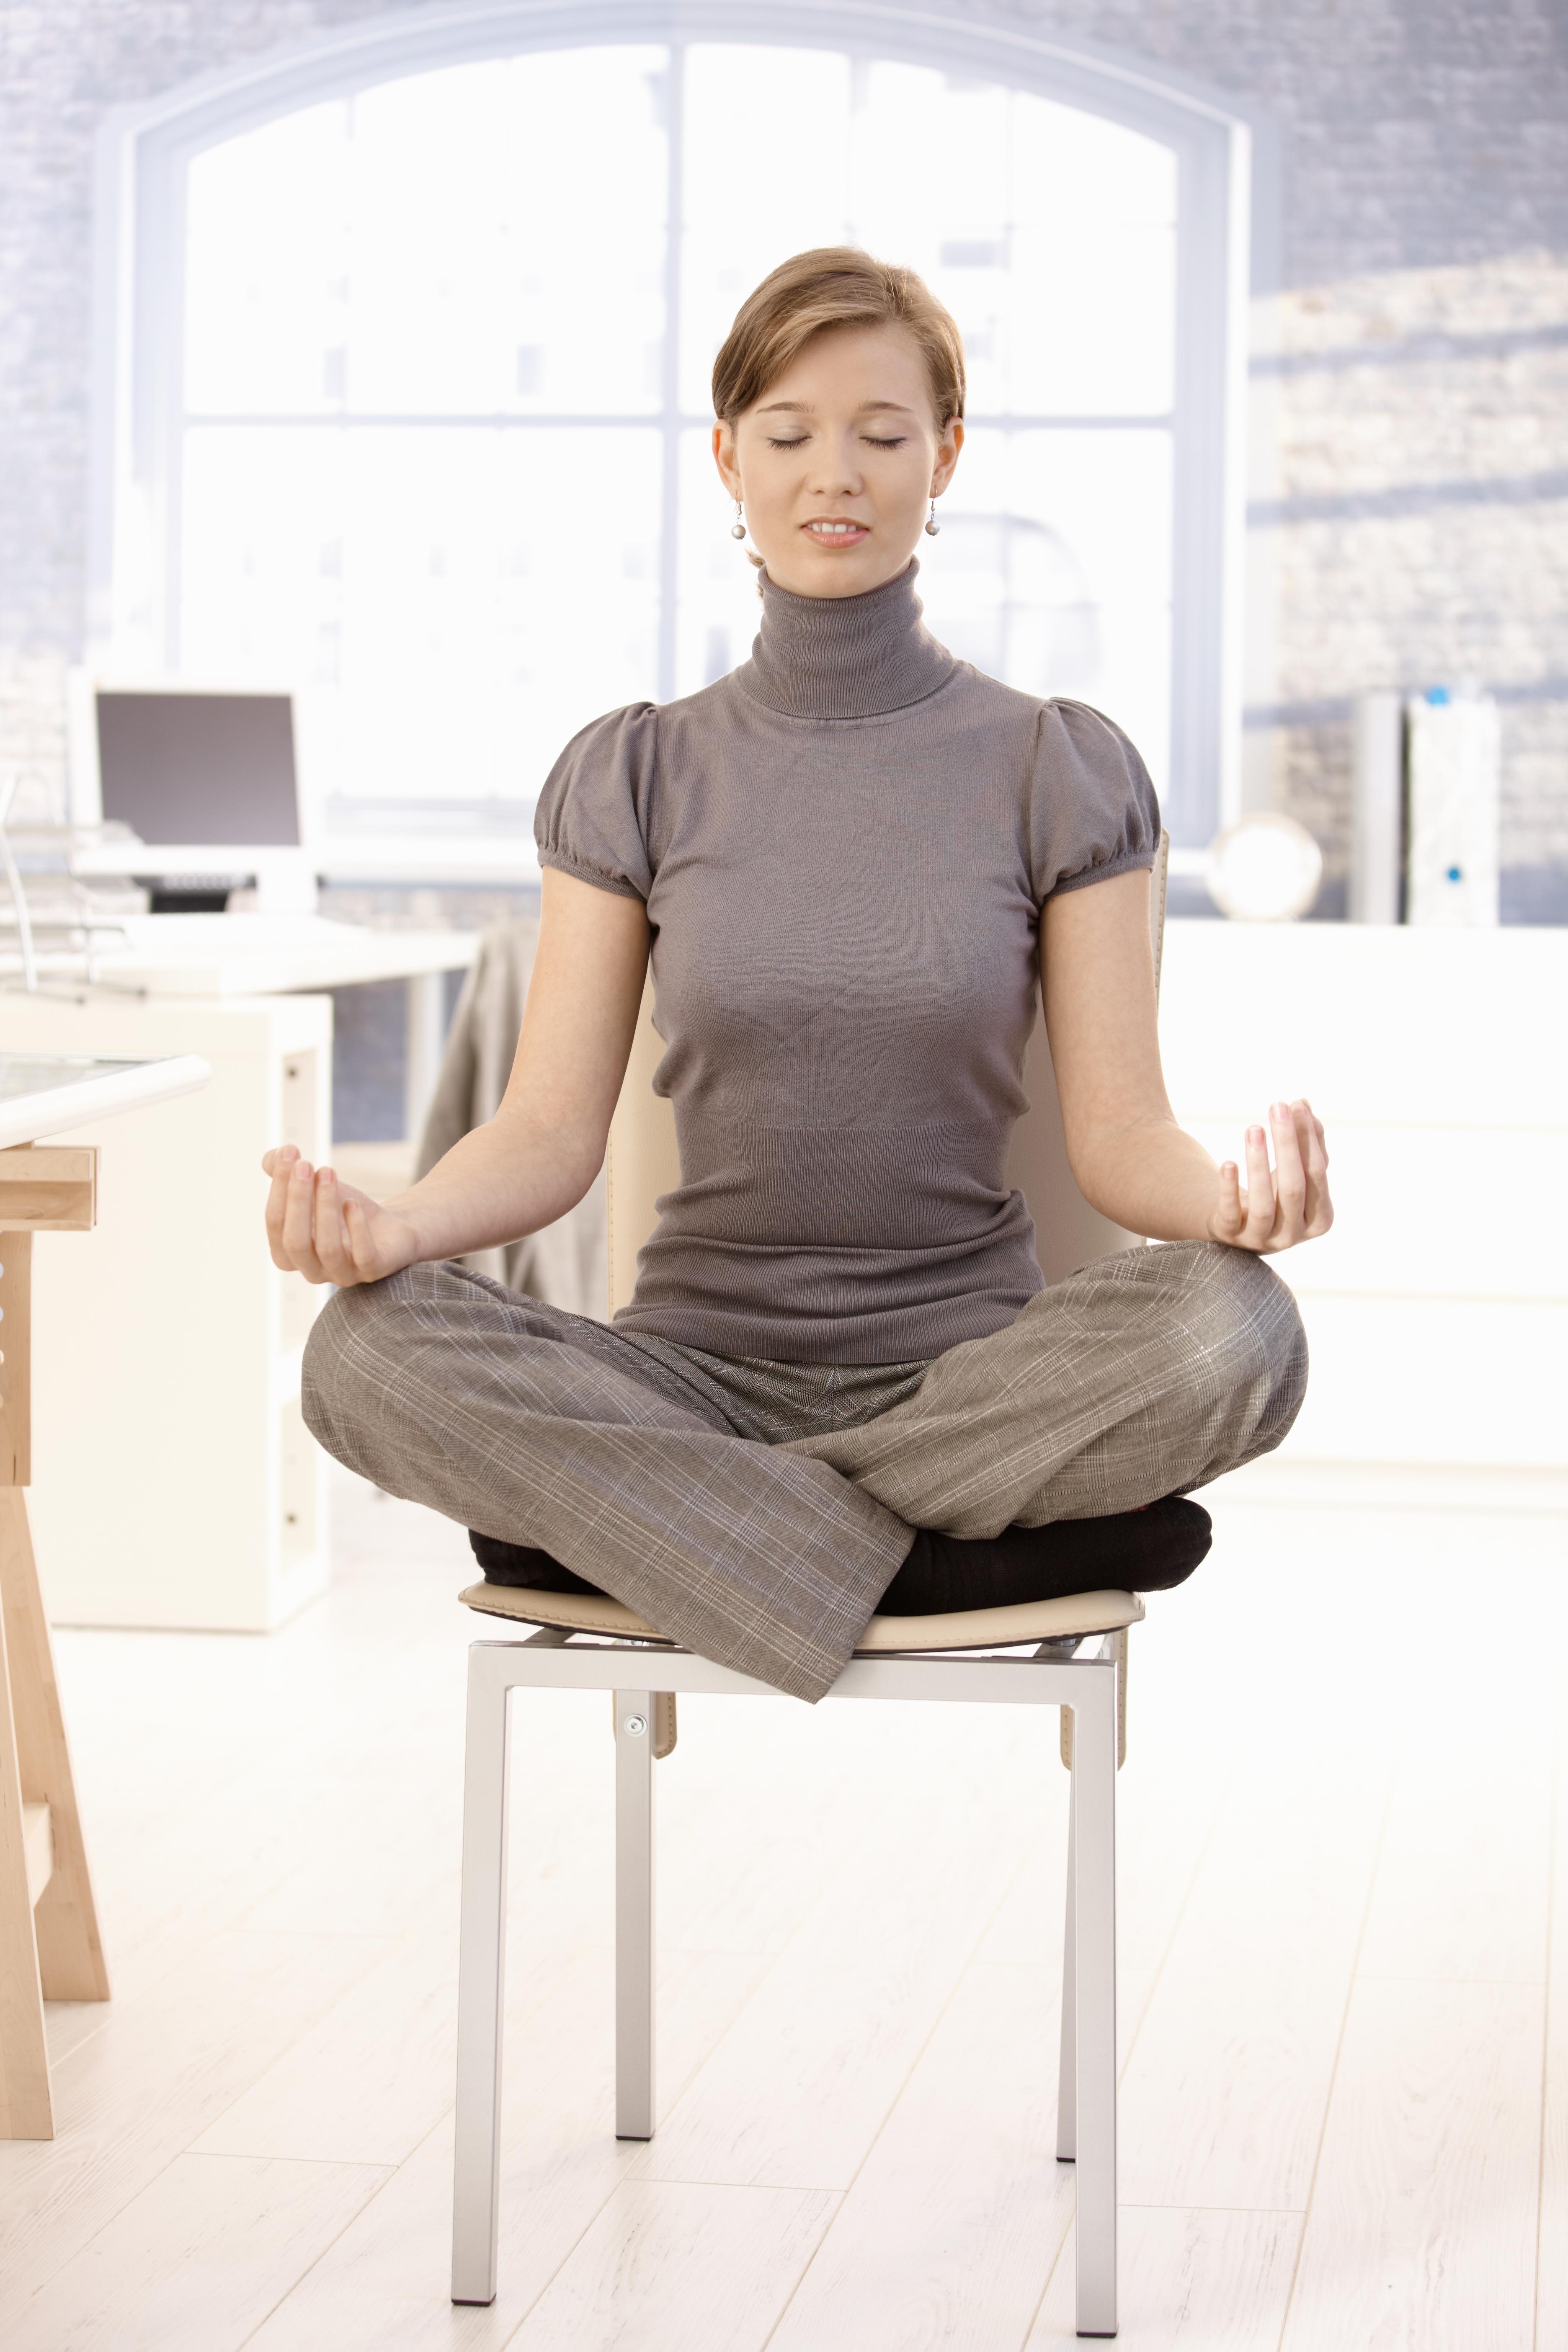 Watch How to Meditate in Sahaja Yoga video